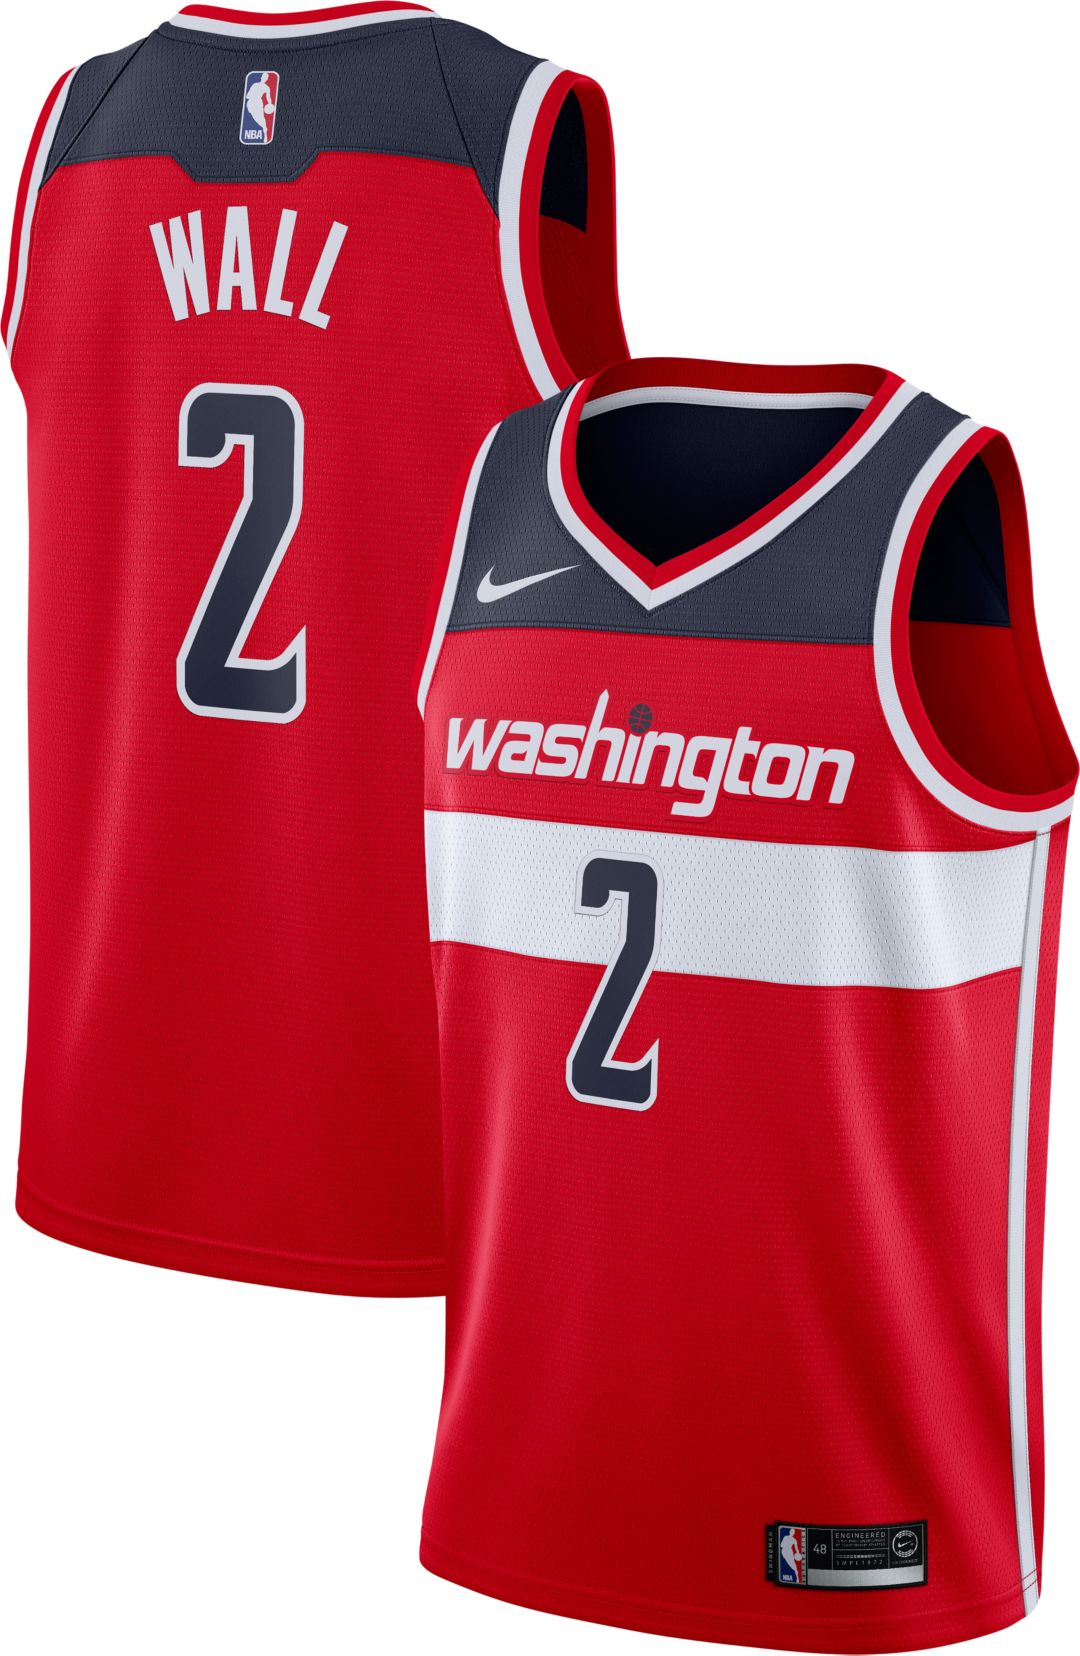 info for 8838b 1f79b Nike Men's Washington Wizards John Wall #2 Red Dri-FIT Swingman Jersey